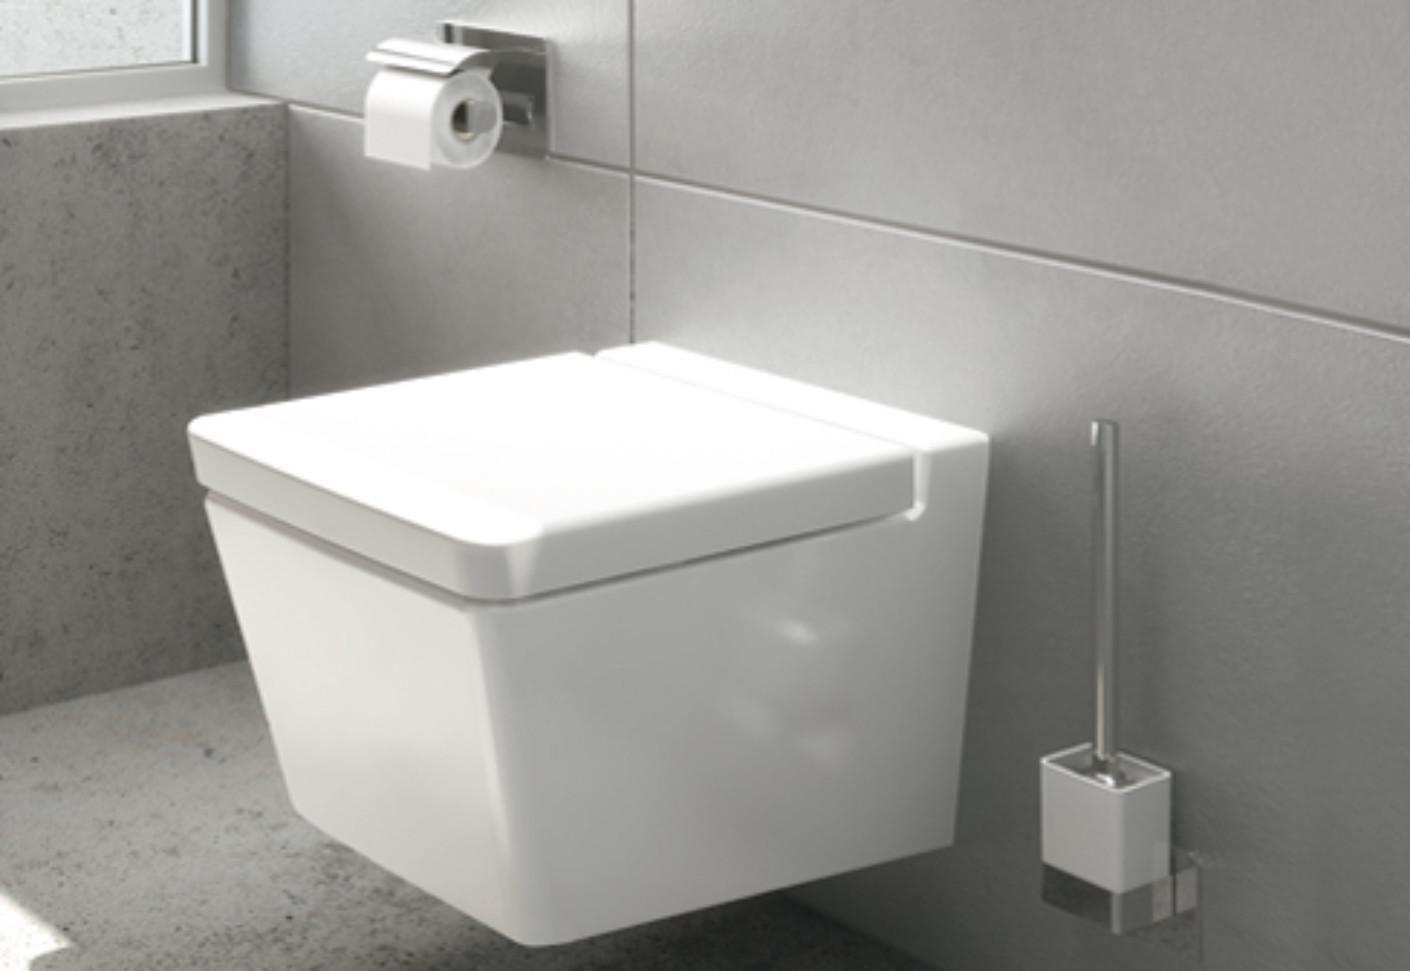 T4 wall-mounted WC VitrAflush 2.0 by VitrA Bathroom | STYLEPARK